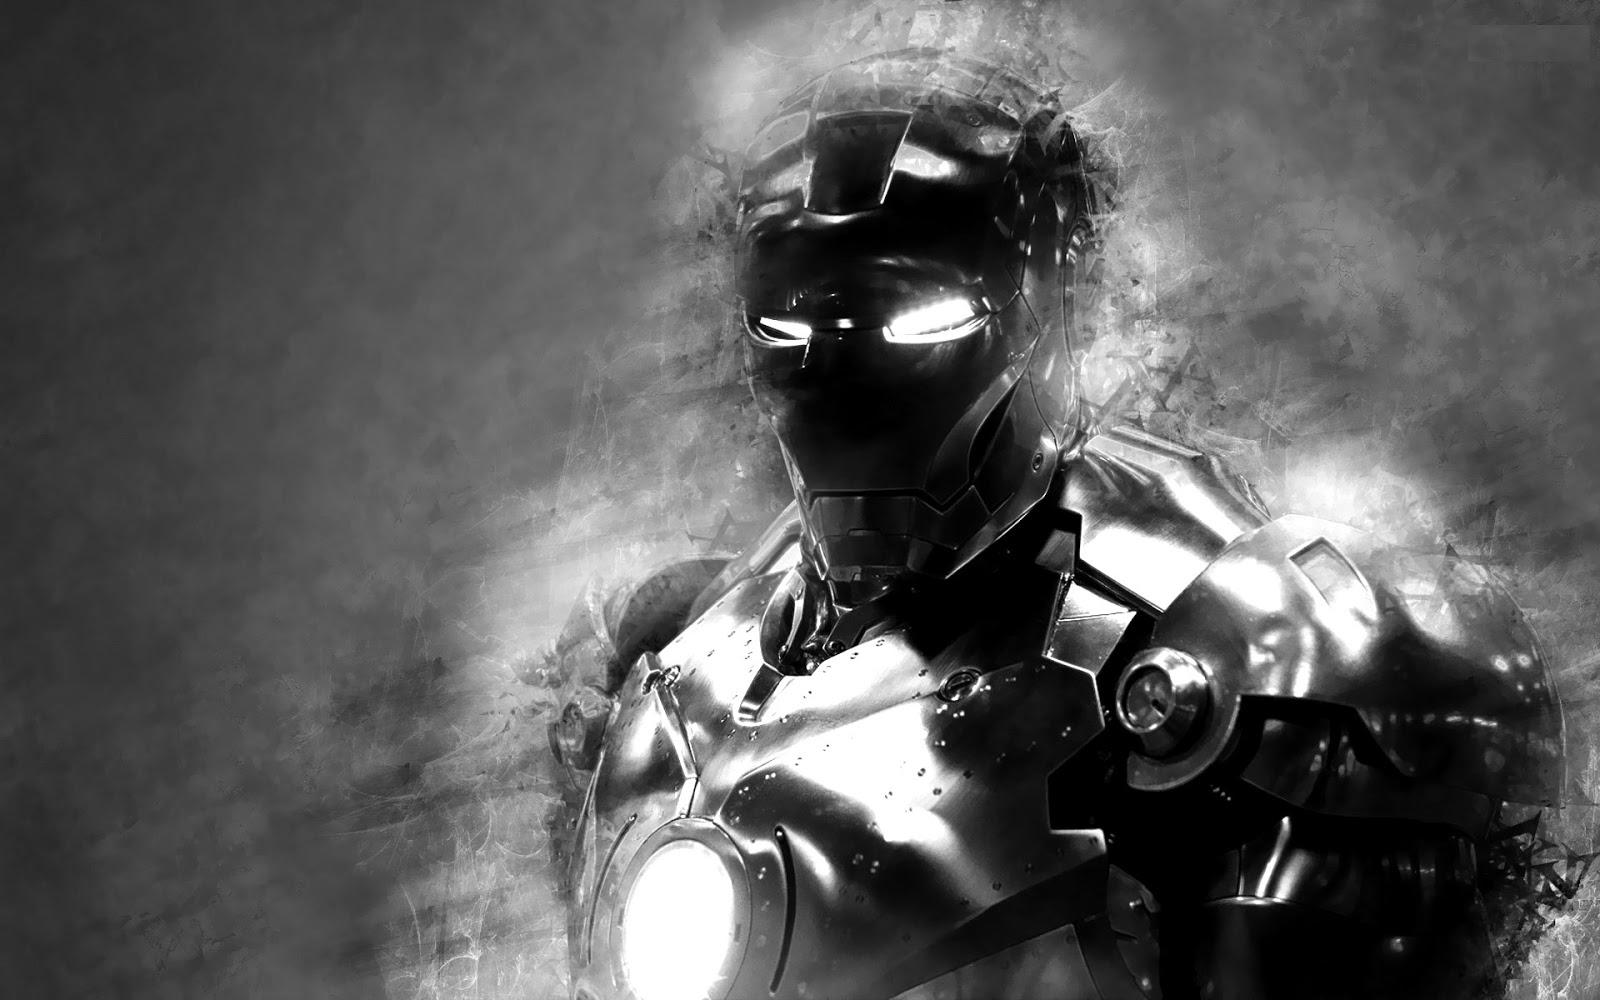 iron man black and white wallpaper - sf wallpaper